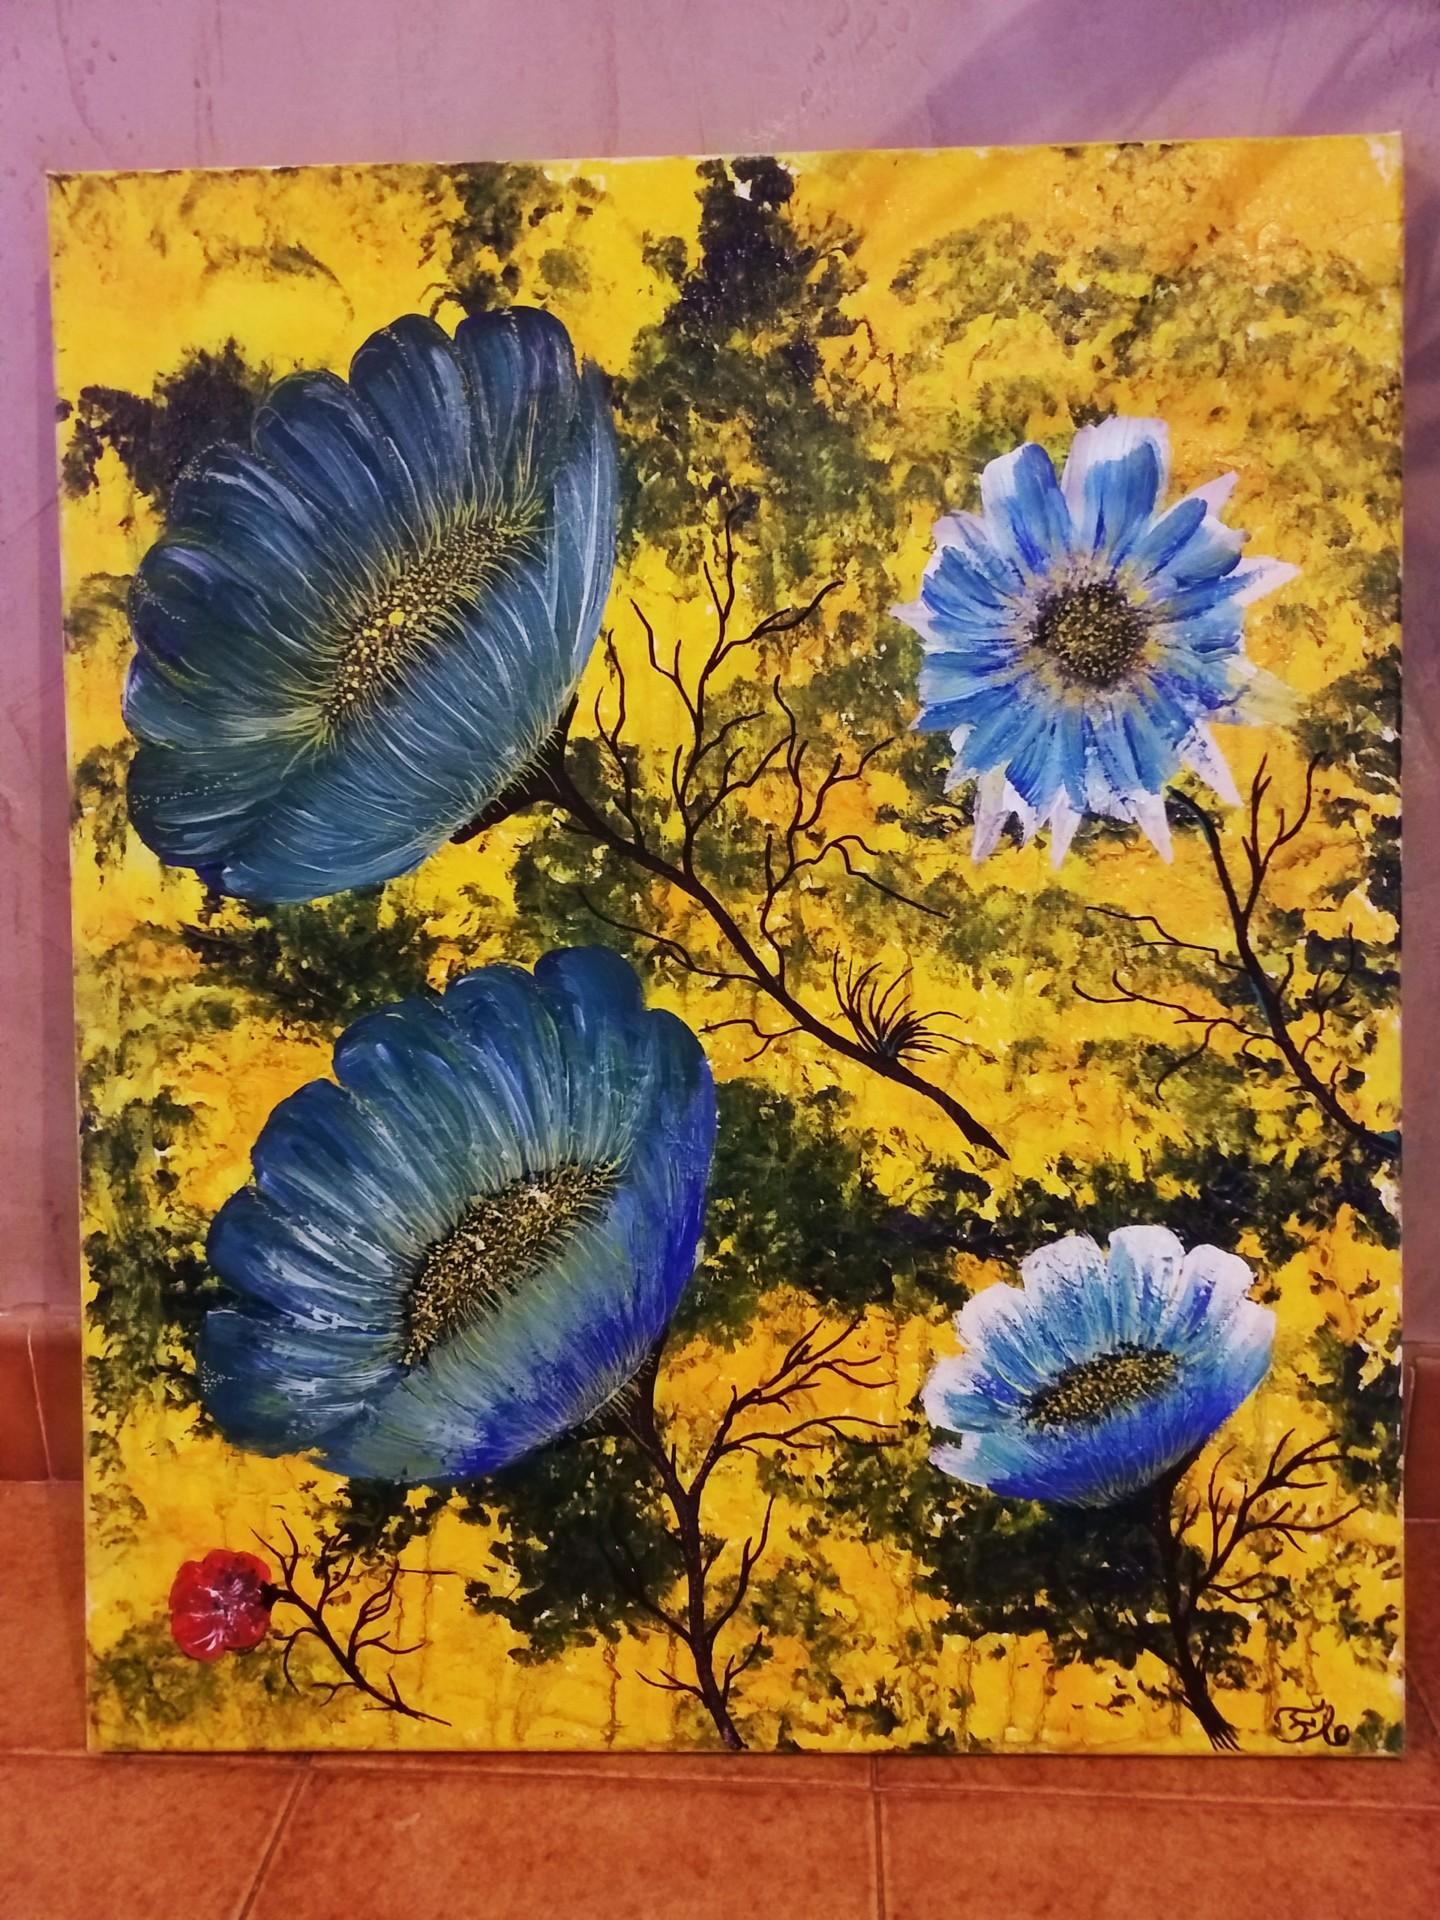 Florence Castelli  flofloyd - Des fleurs bleues